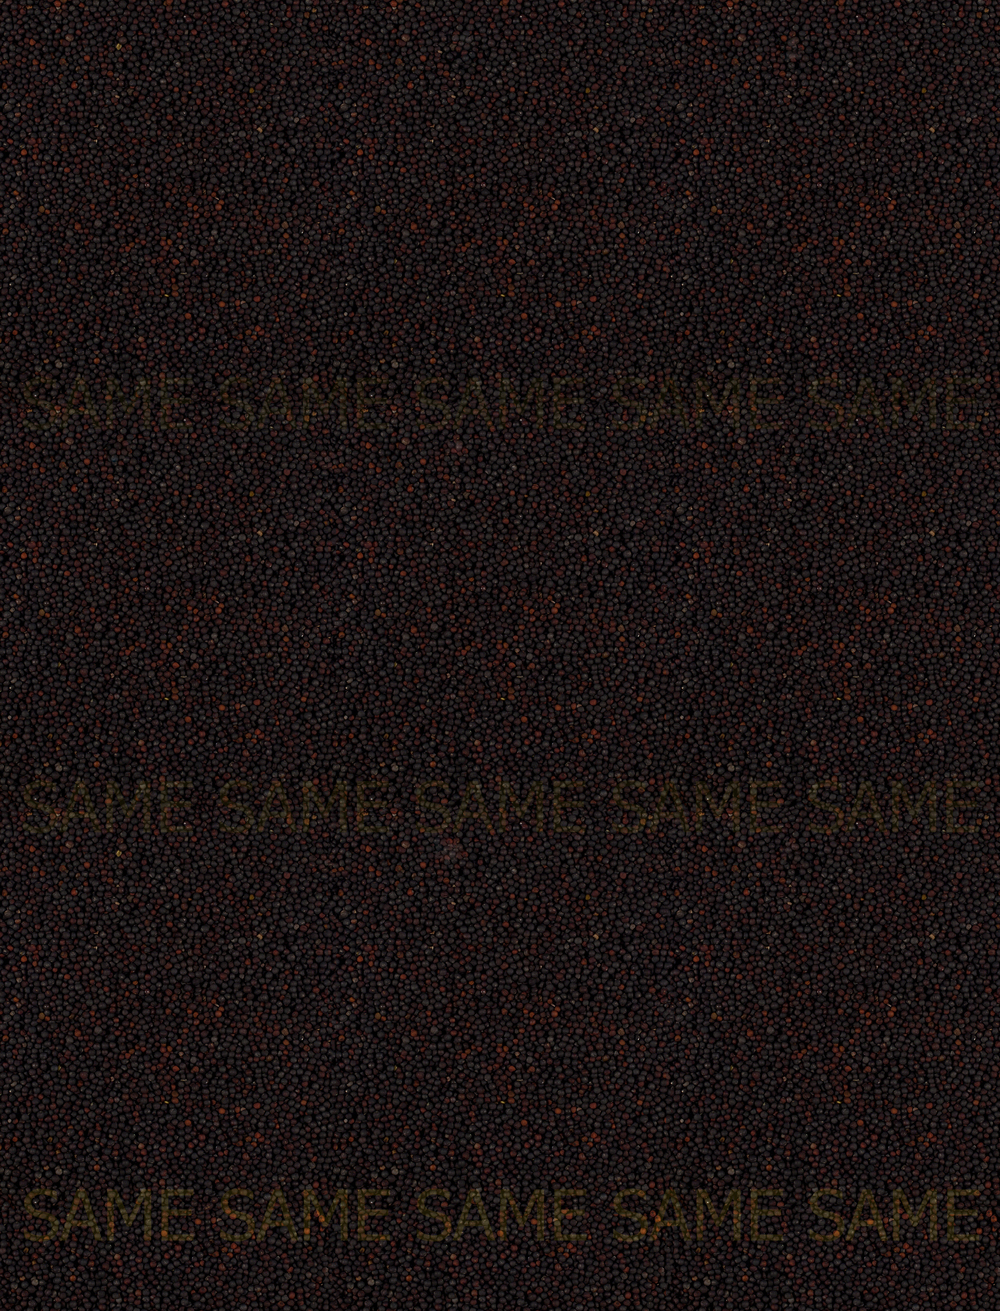 Canola - Same